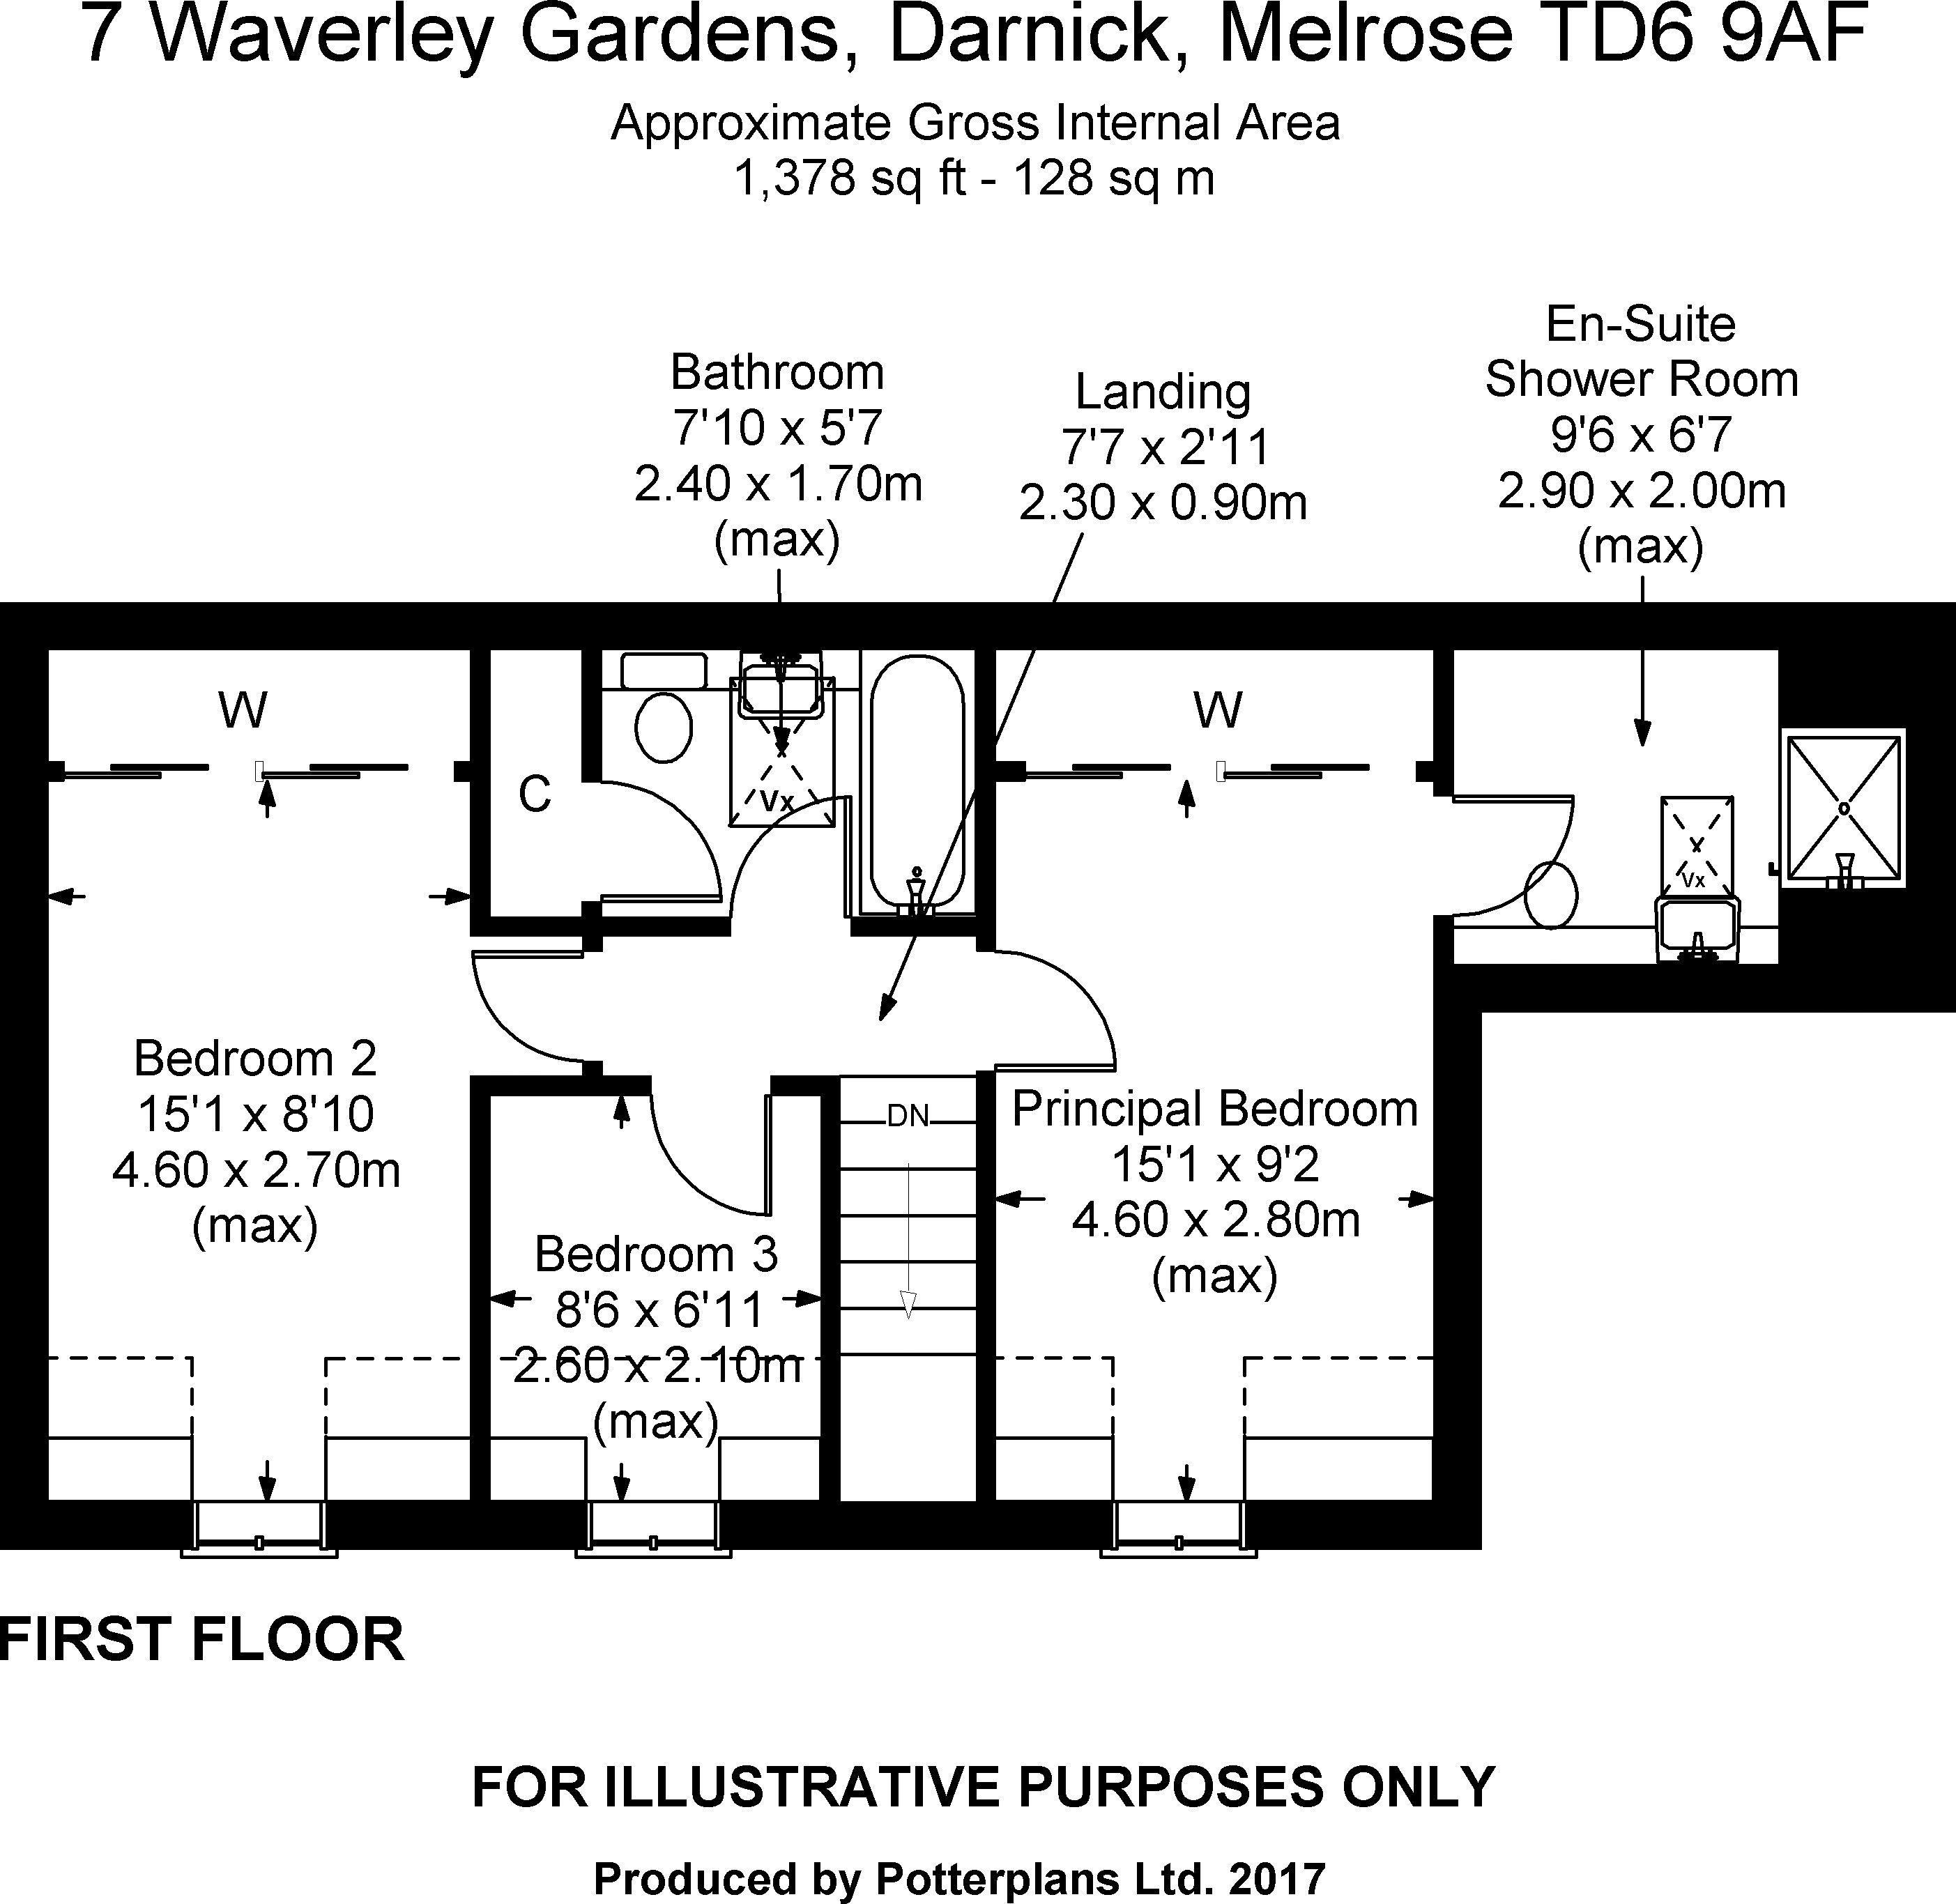 7 Waverley Gardens First Floor